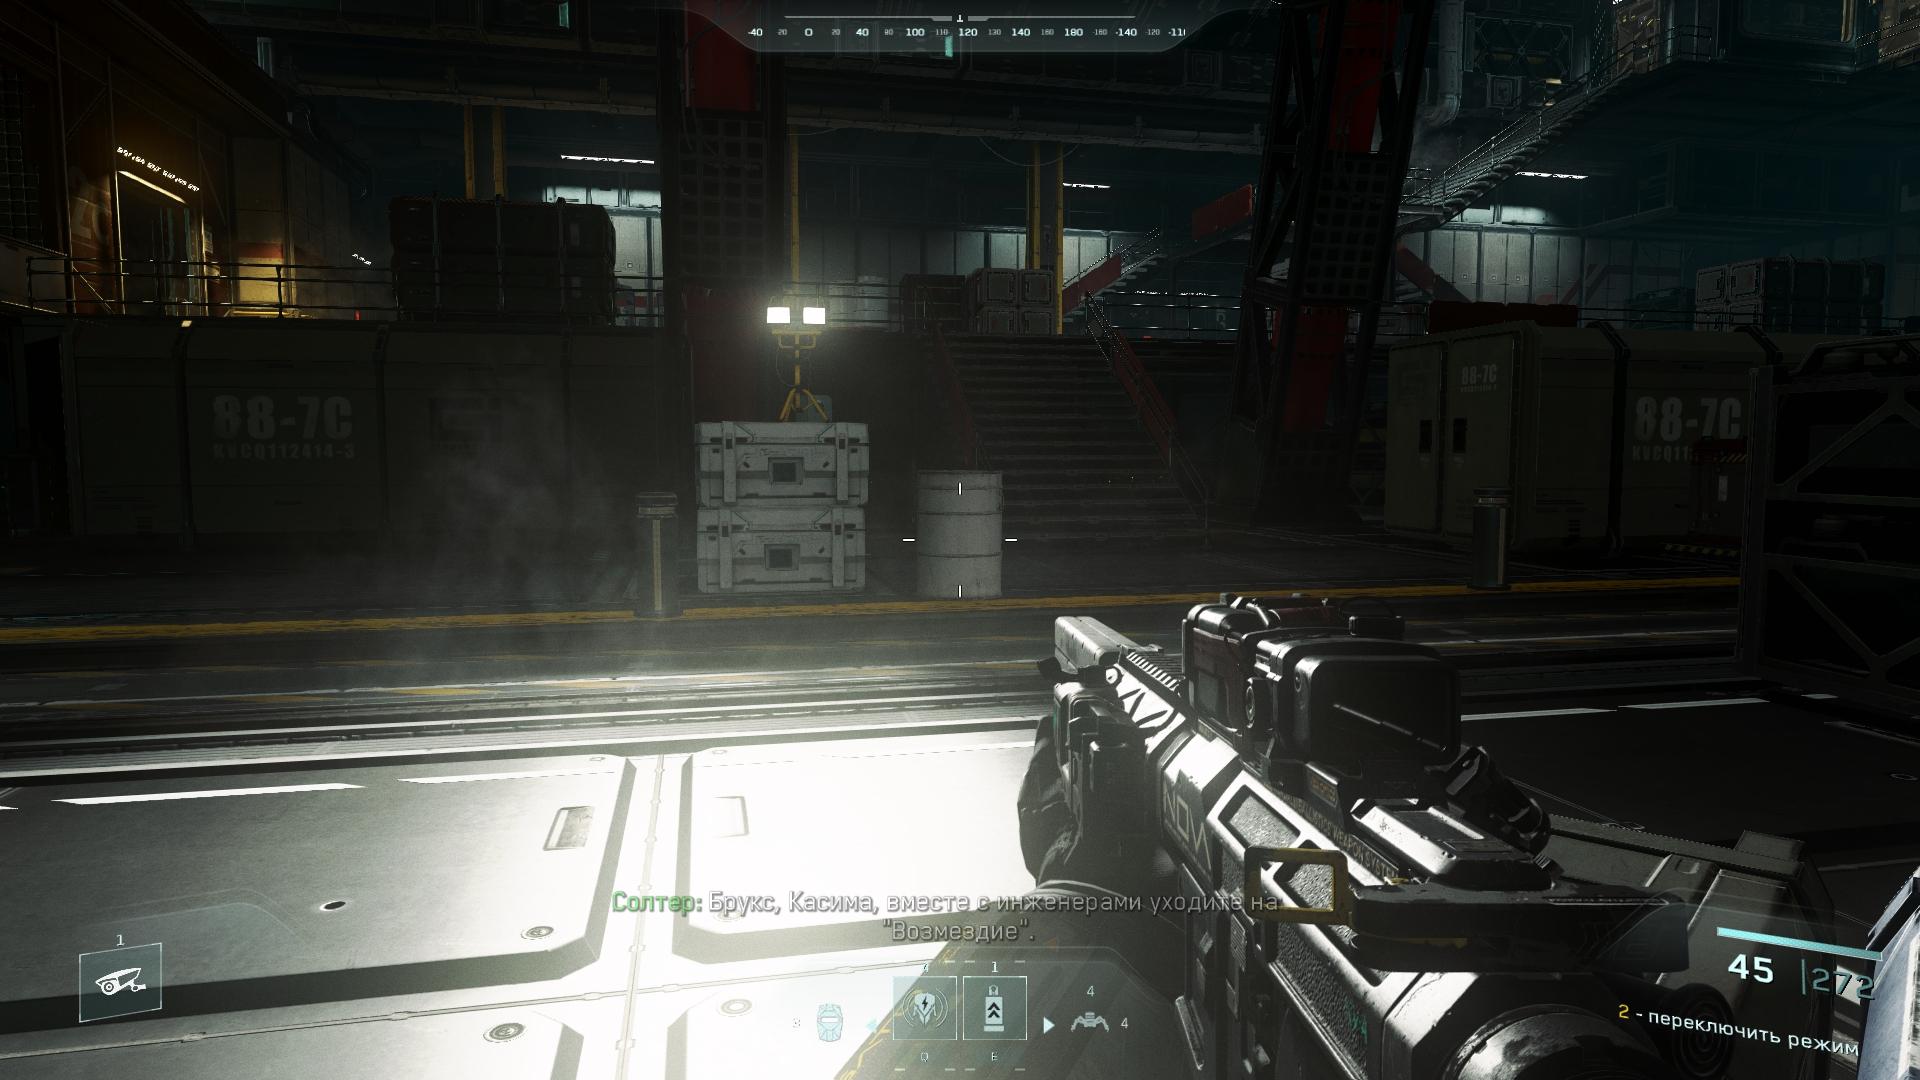 00066.Jpg - Call of Duty: Infinite Warfare